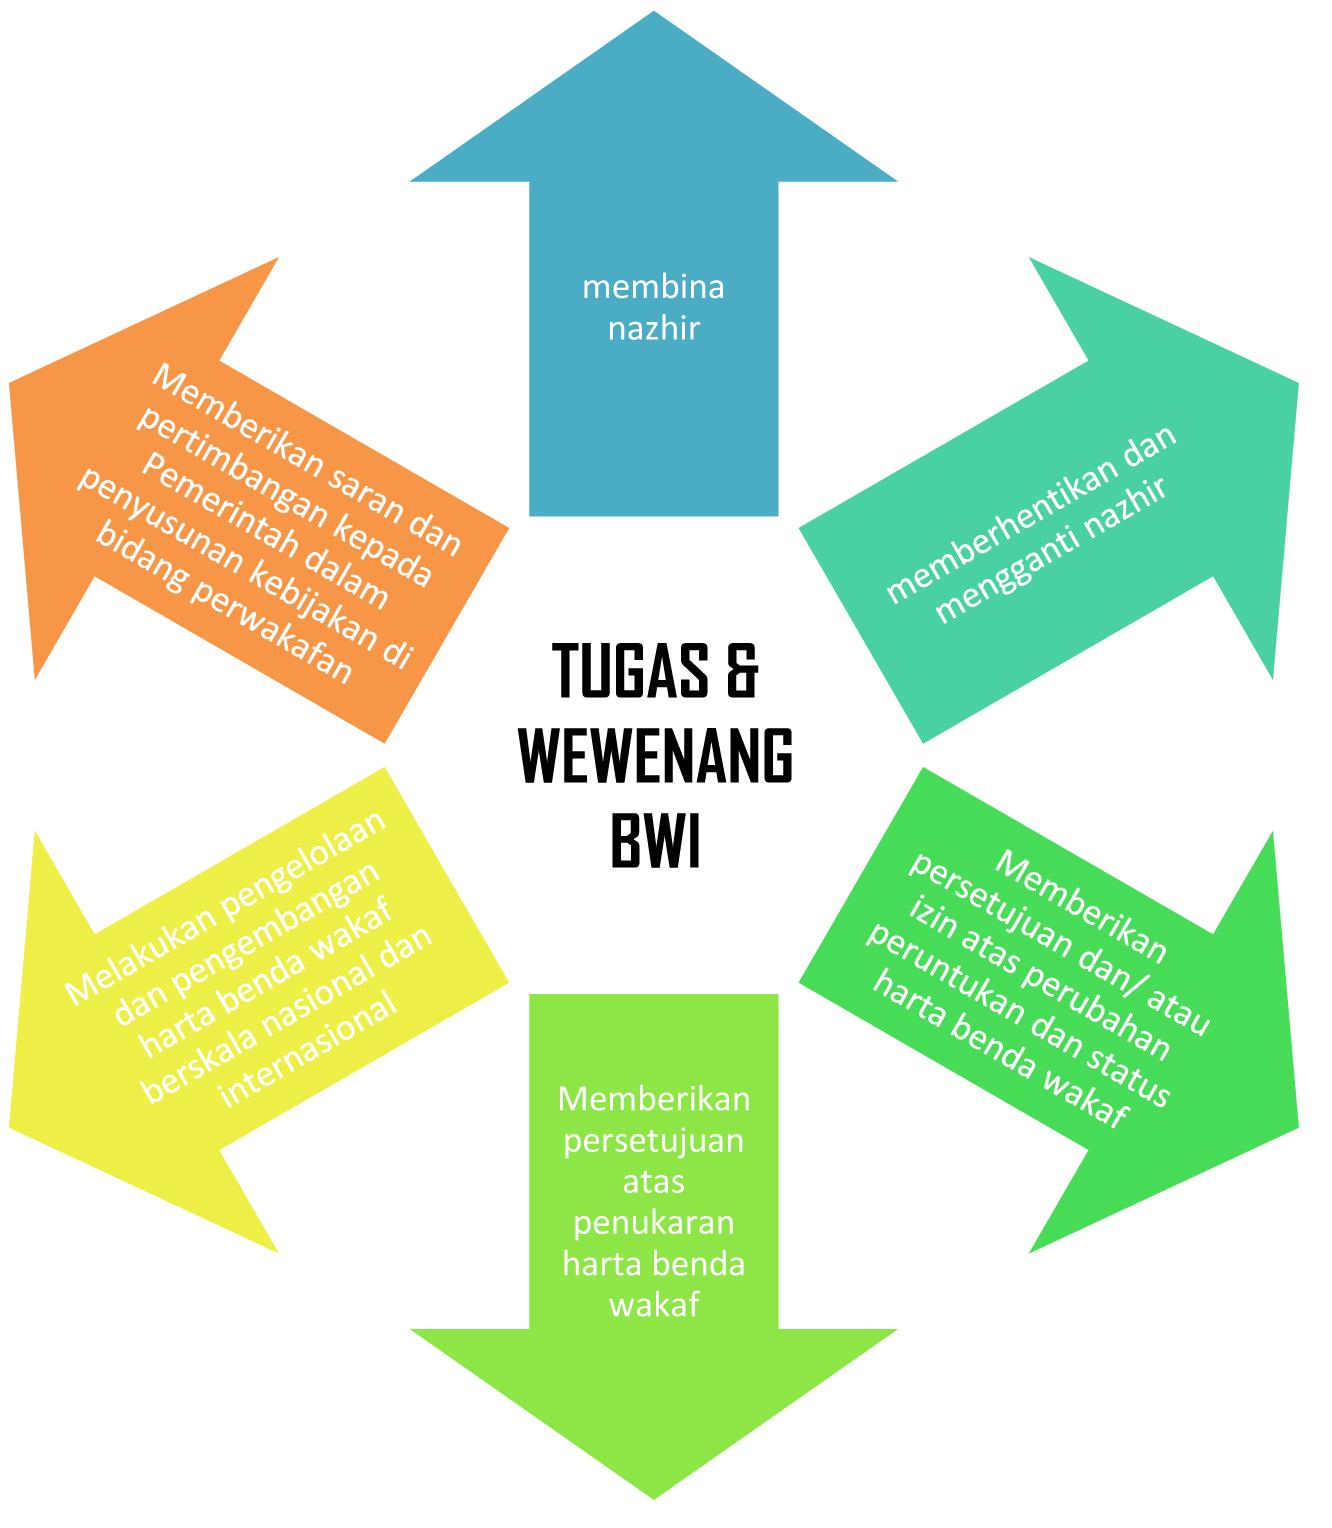 Tugas dan Wewenang  - Tugas dan Wewenang Badan Wakaf Indonesia - Tugas dan Wewenang